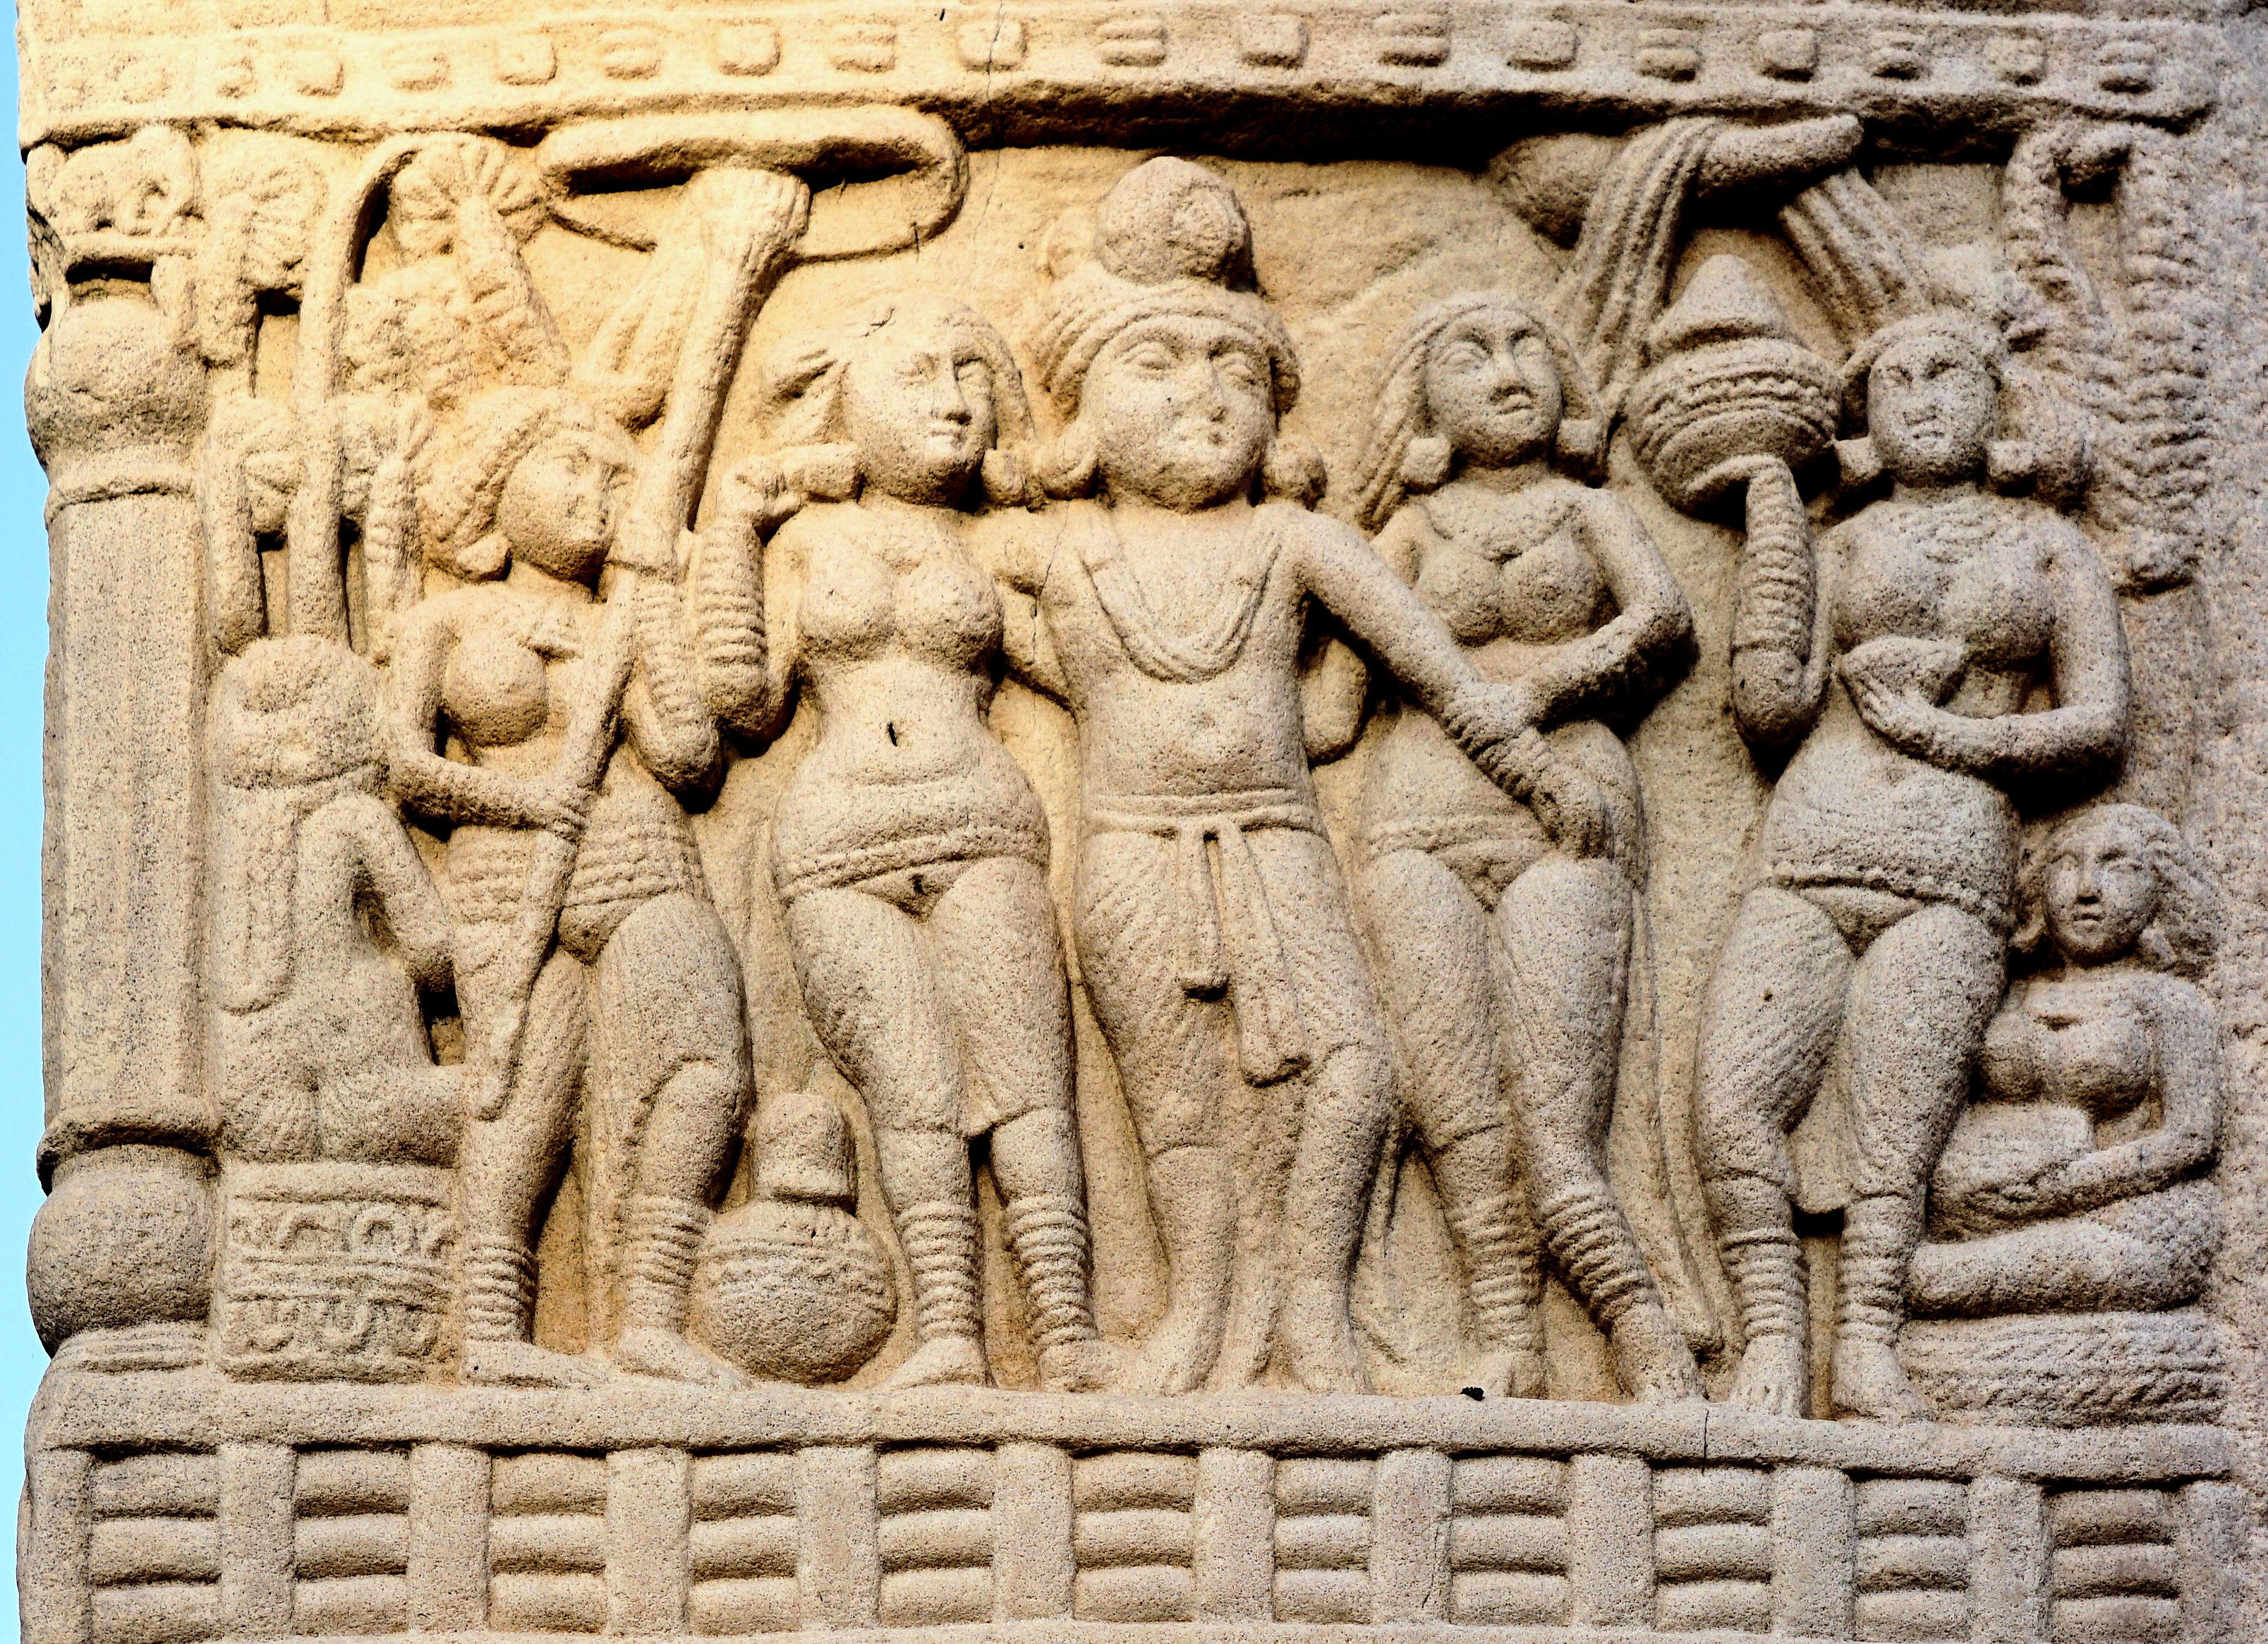 https://upload.wikimedia.org/wikipedia/commons/b/b4/Sanchi_King_Ashoka_with_his_Queens%2C_South_Gate%2C_Stupa_no._1.jpg